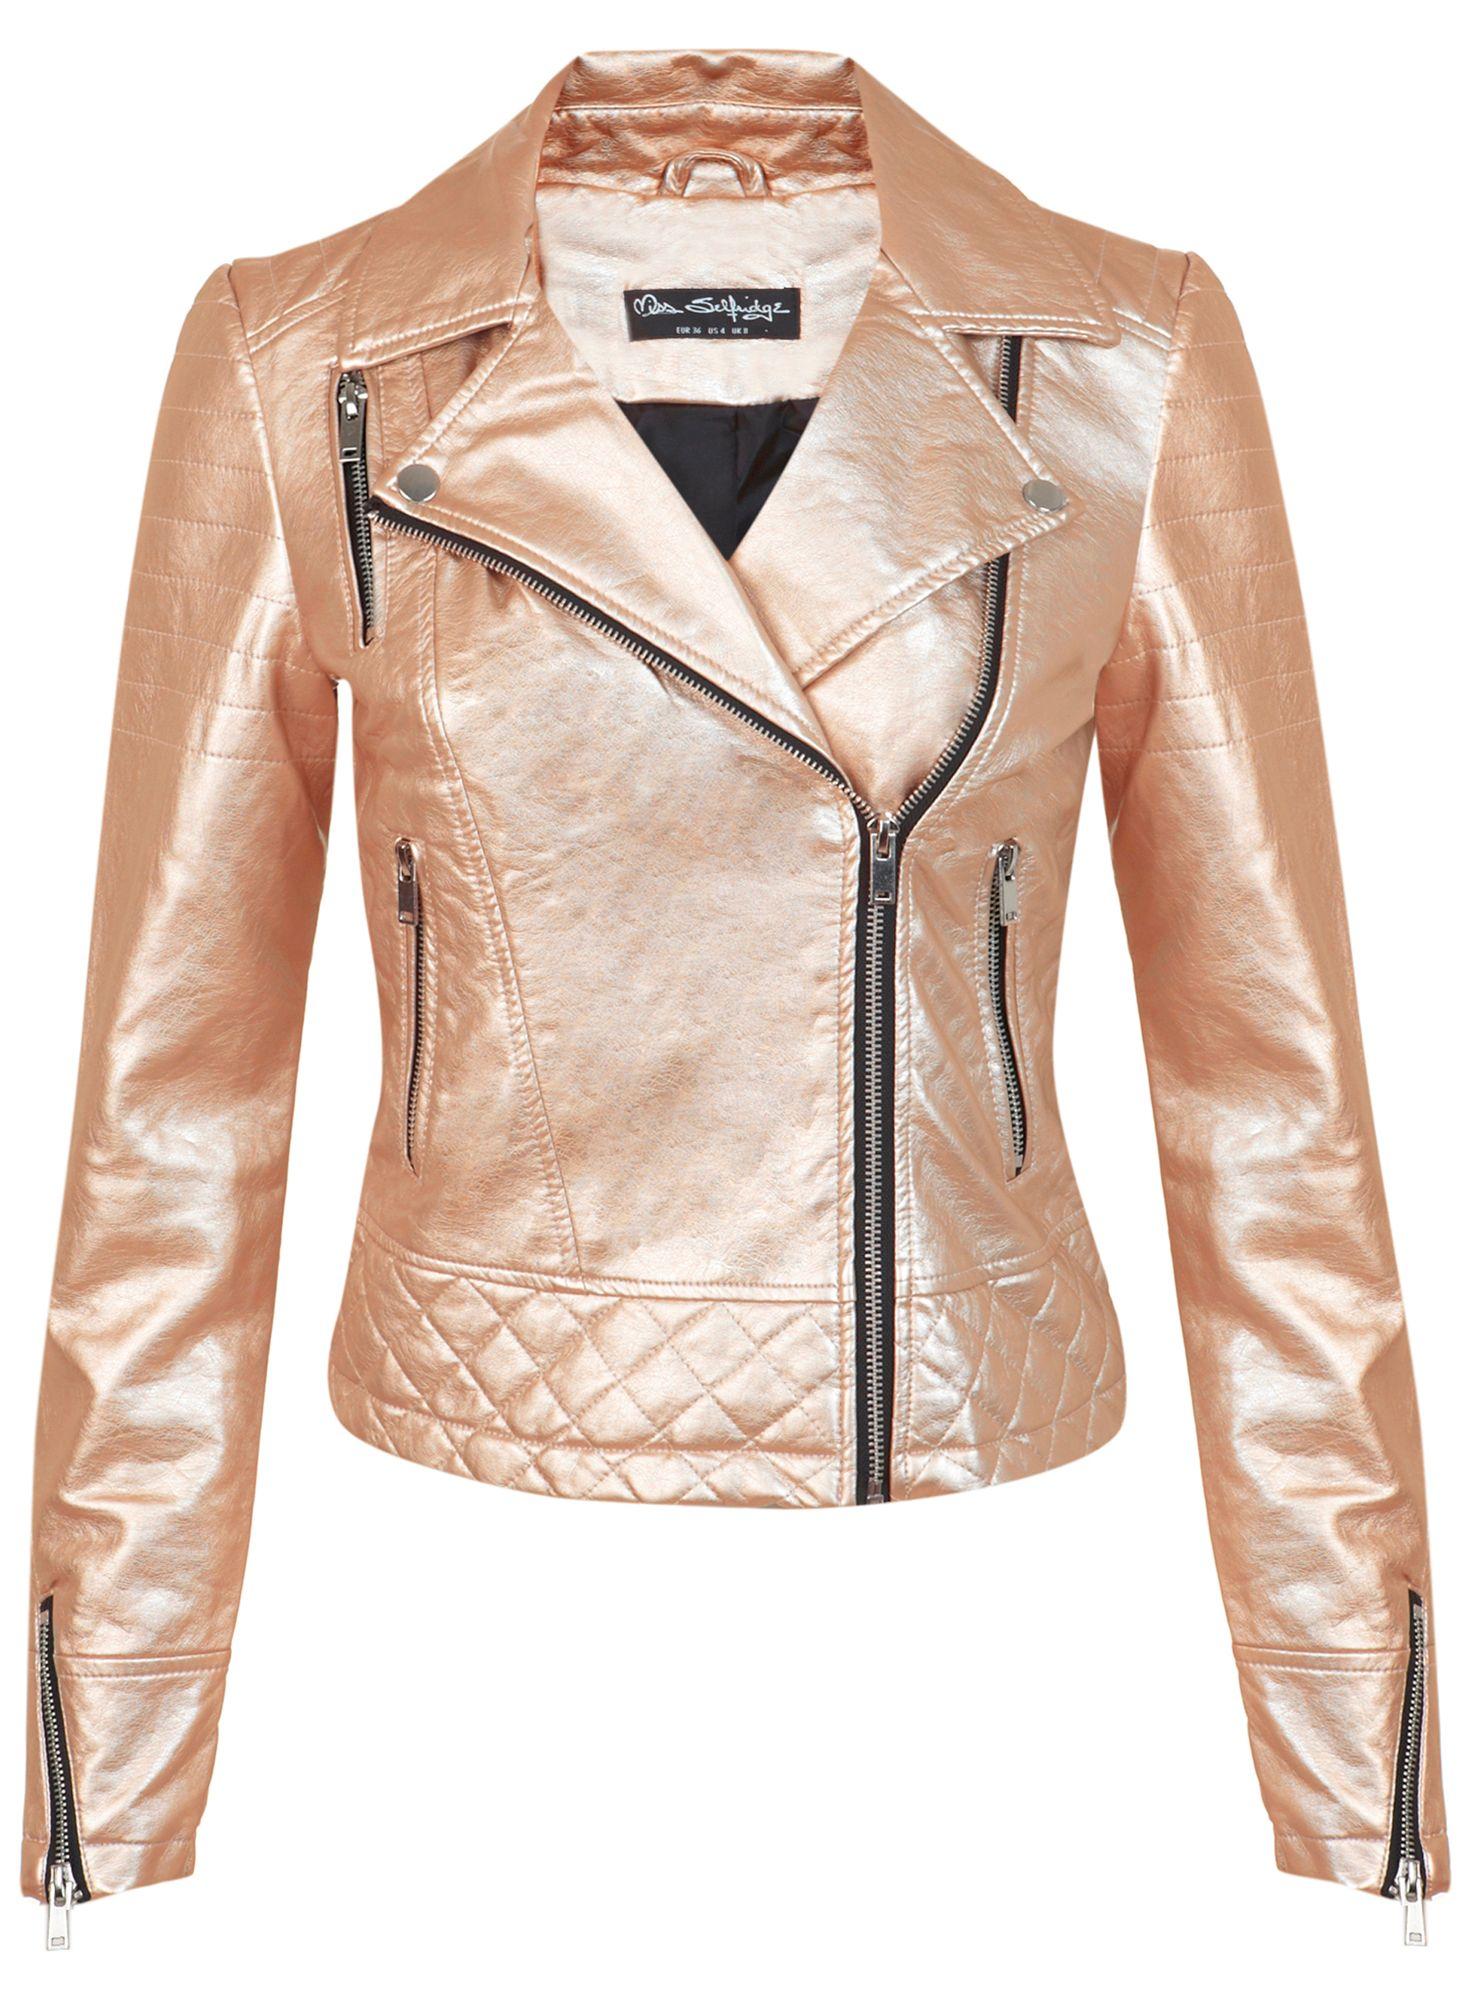 Miss Selfridge Rose Gold Faux Leather Jacket In Metallic